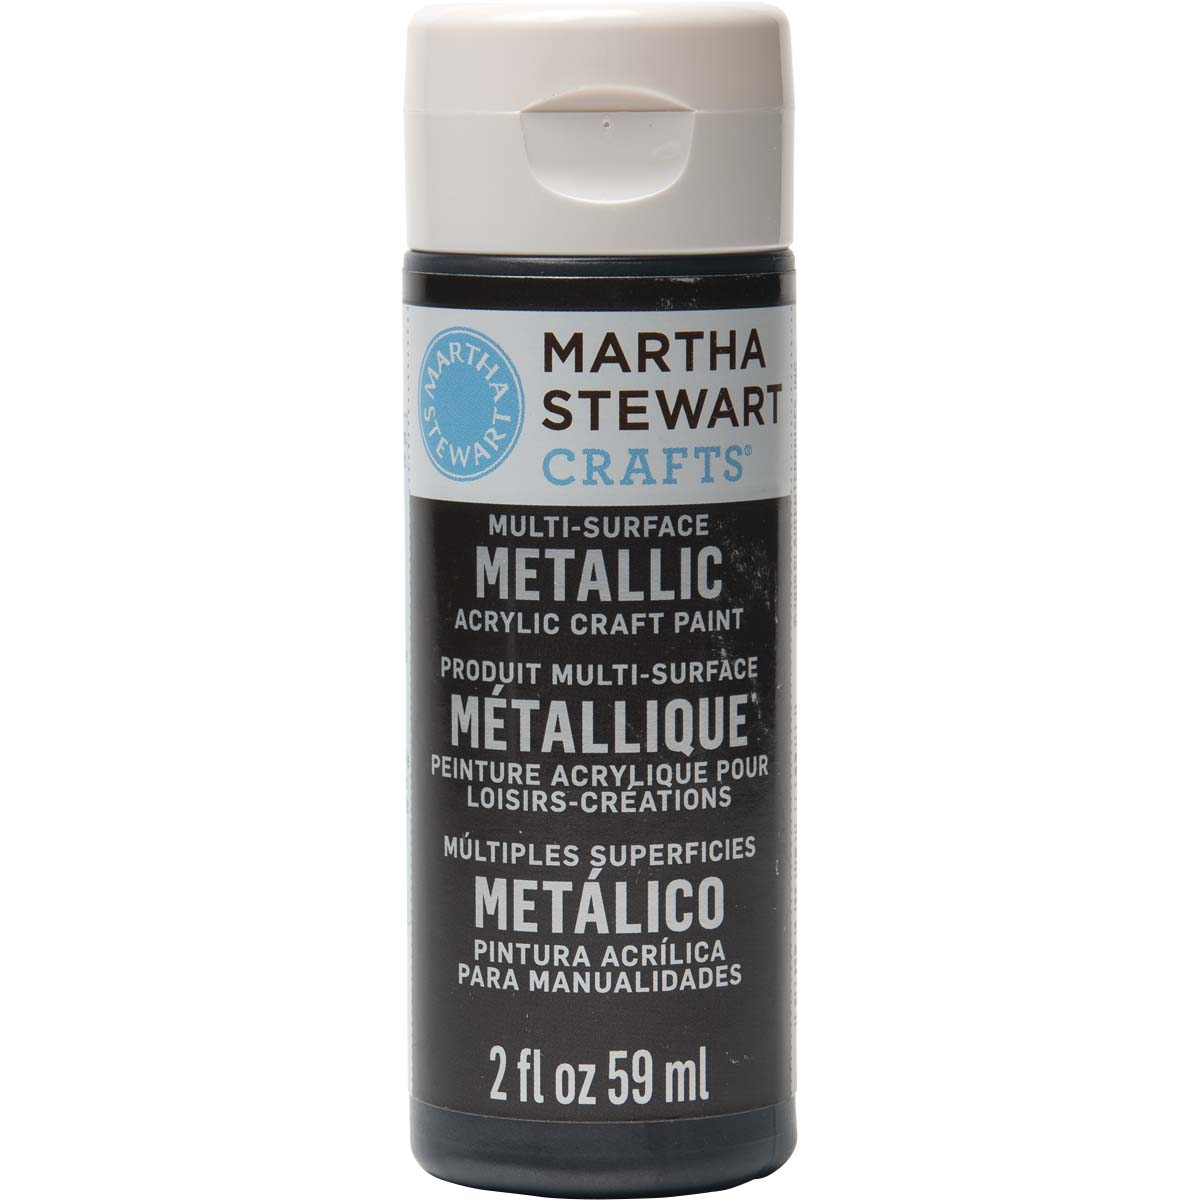 Martha Stewart ® Multi-Surface Metallic Acrylic Craft Paint - Black Nickel, 2 oz. - 32989CA